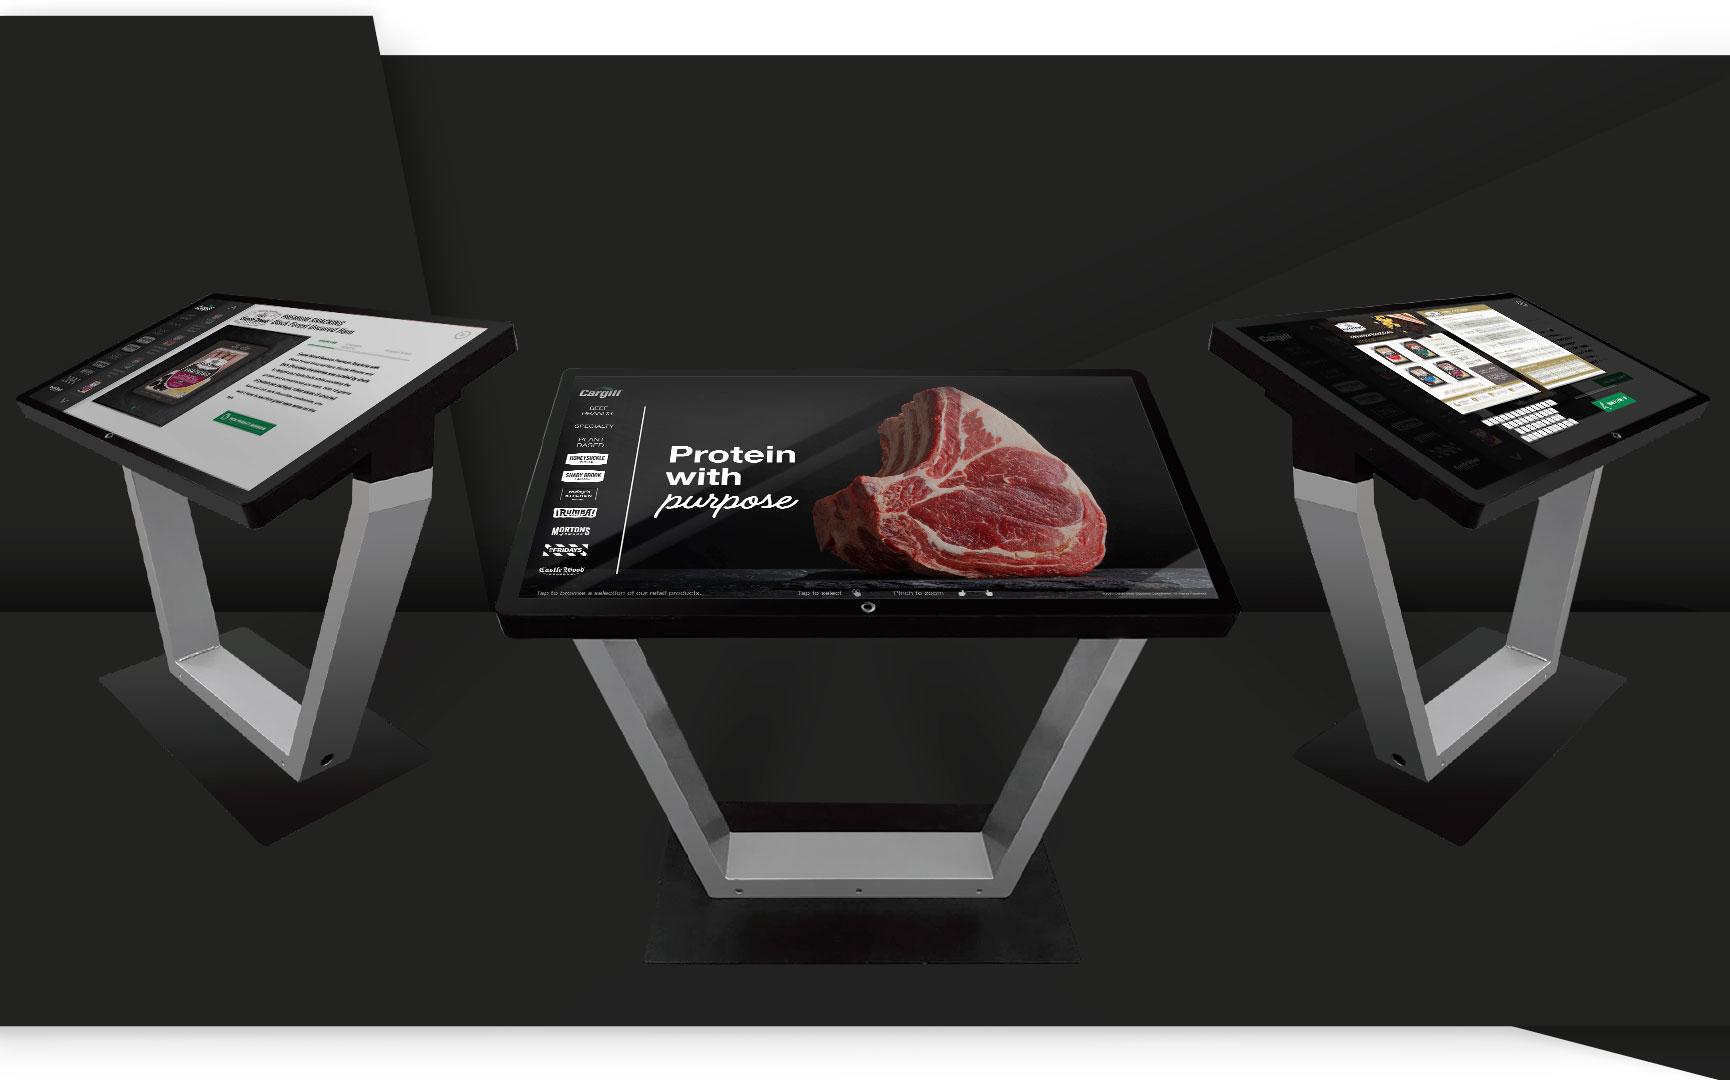 Cargill Trade Show Digital Meat Case